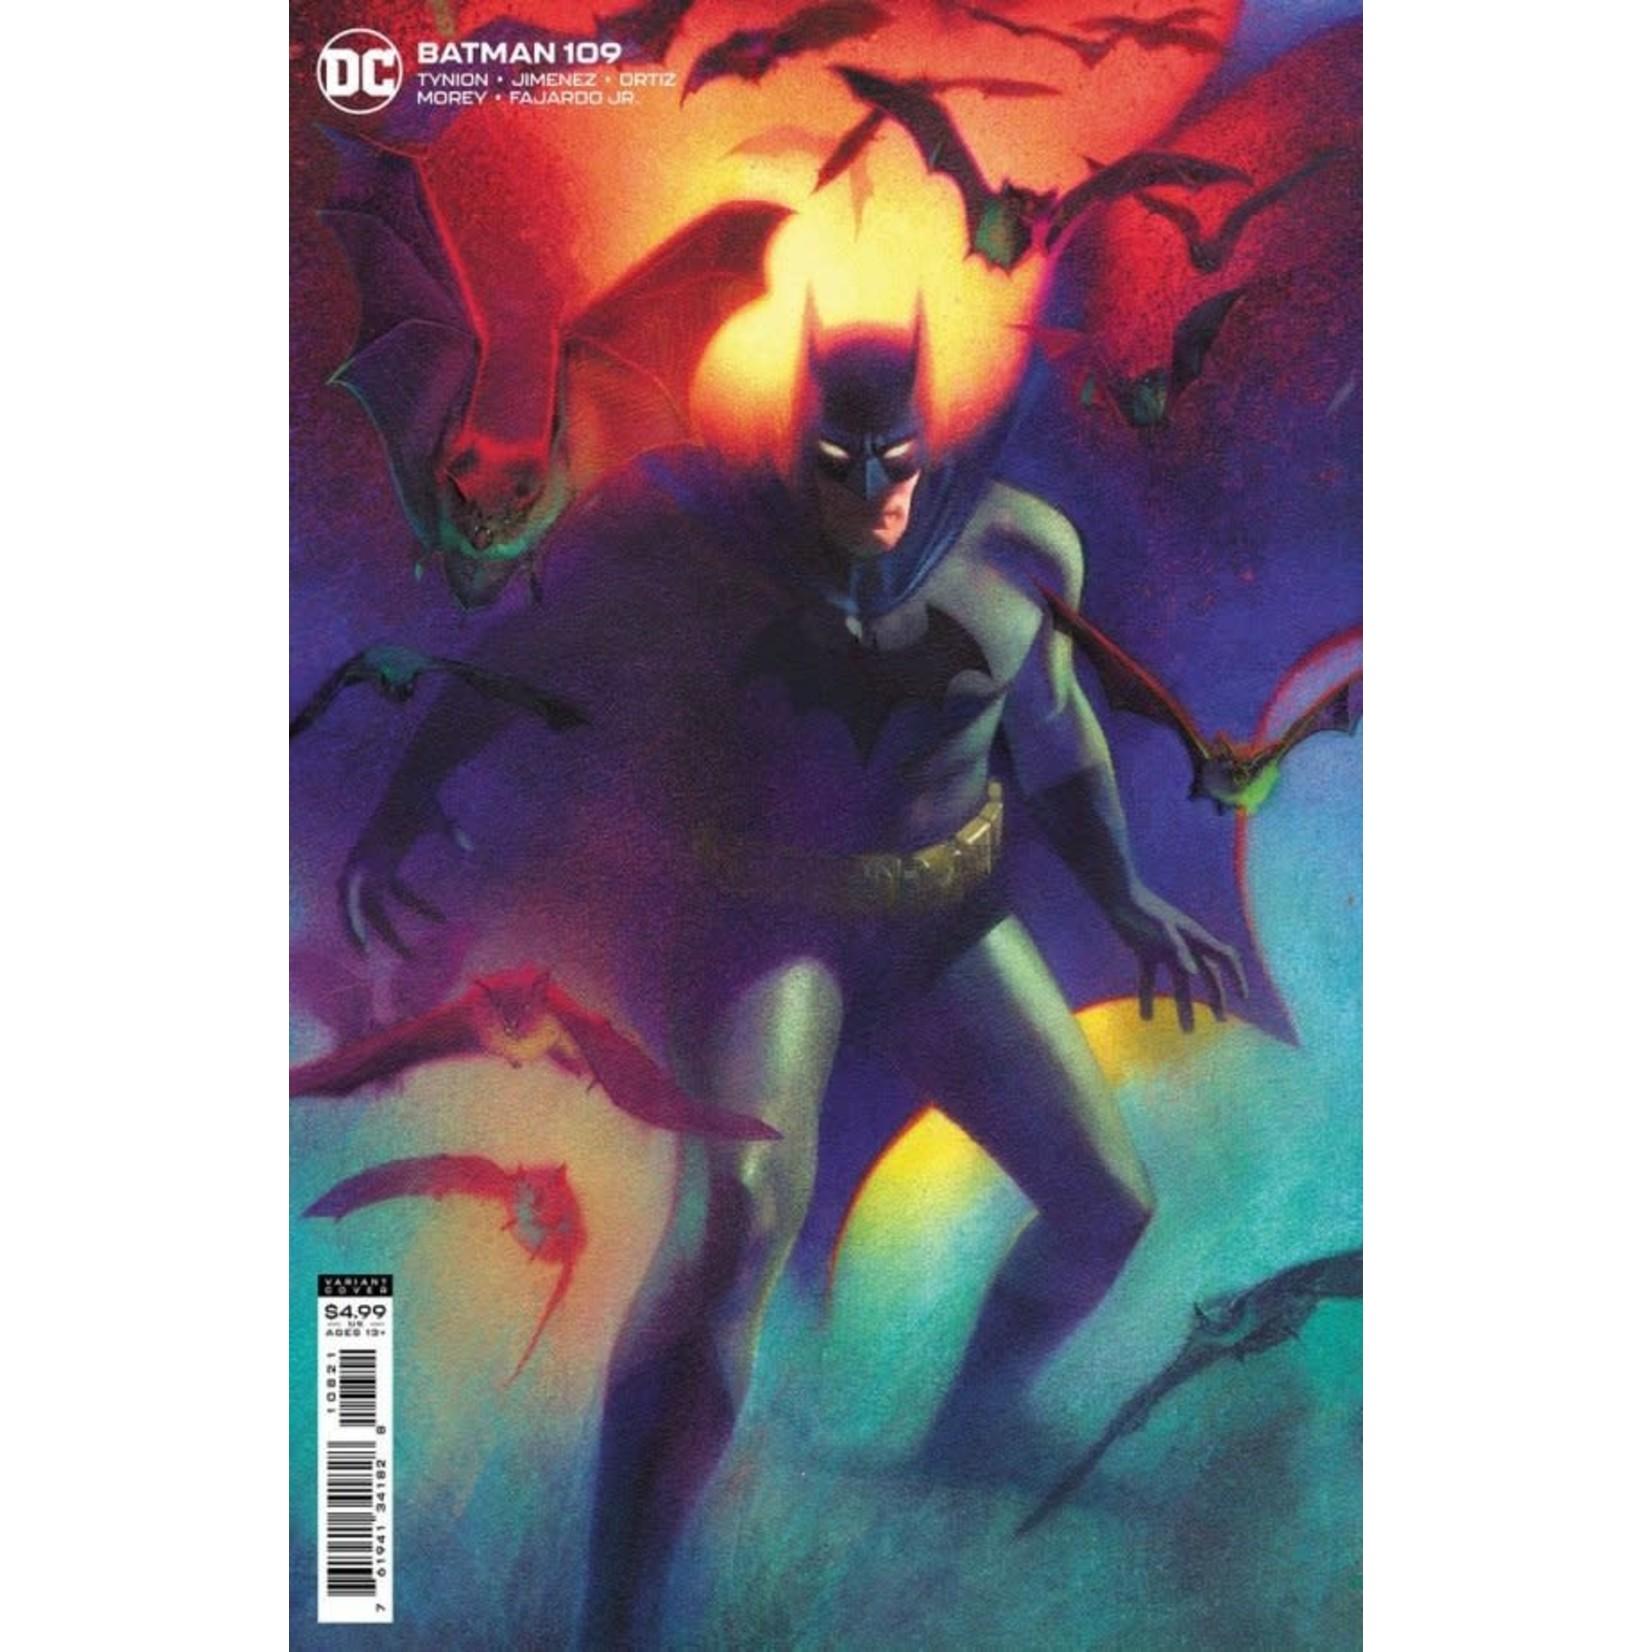 DC Comics BATMAN #109 CVR B JOSHUA MIDDLETON VAR